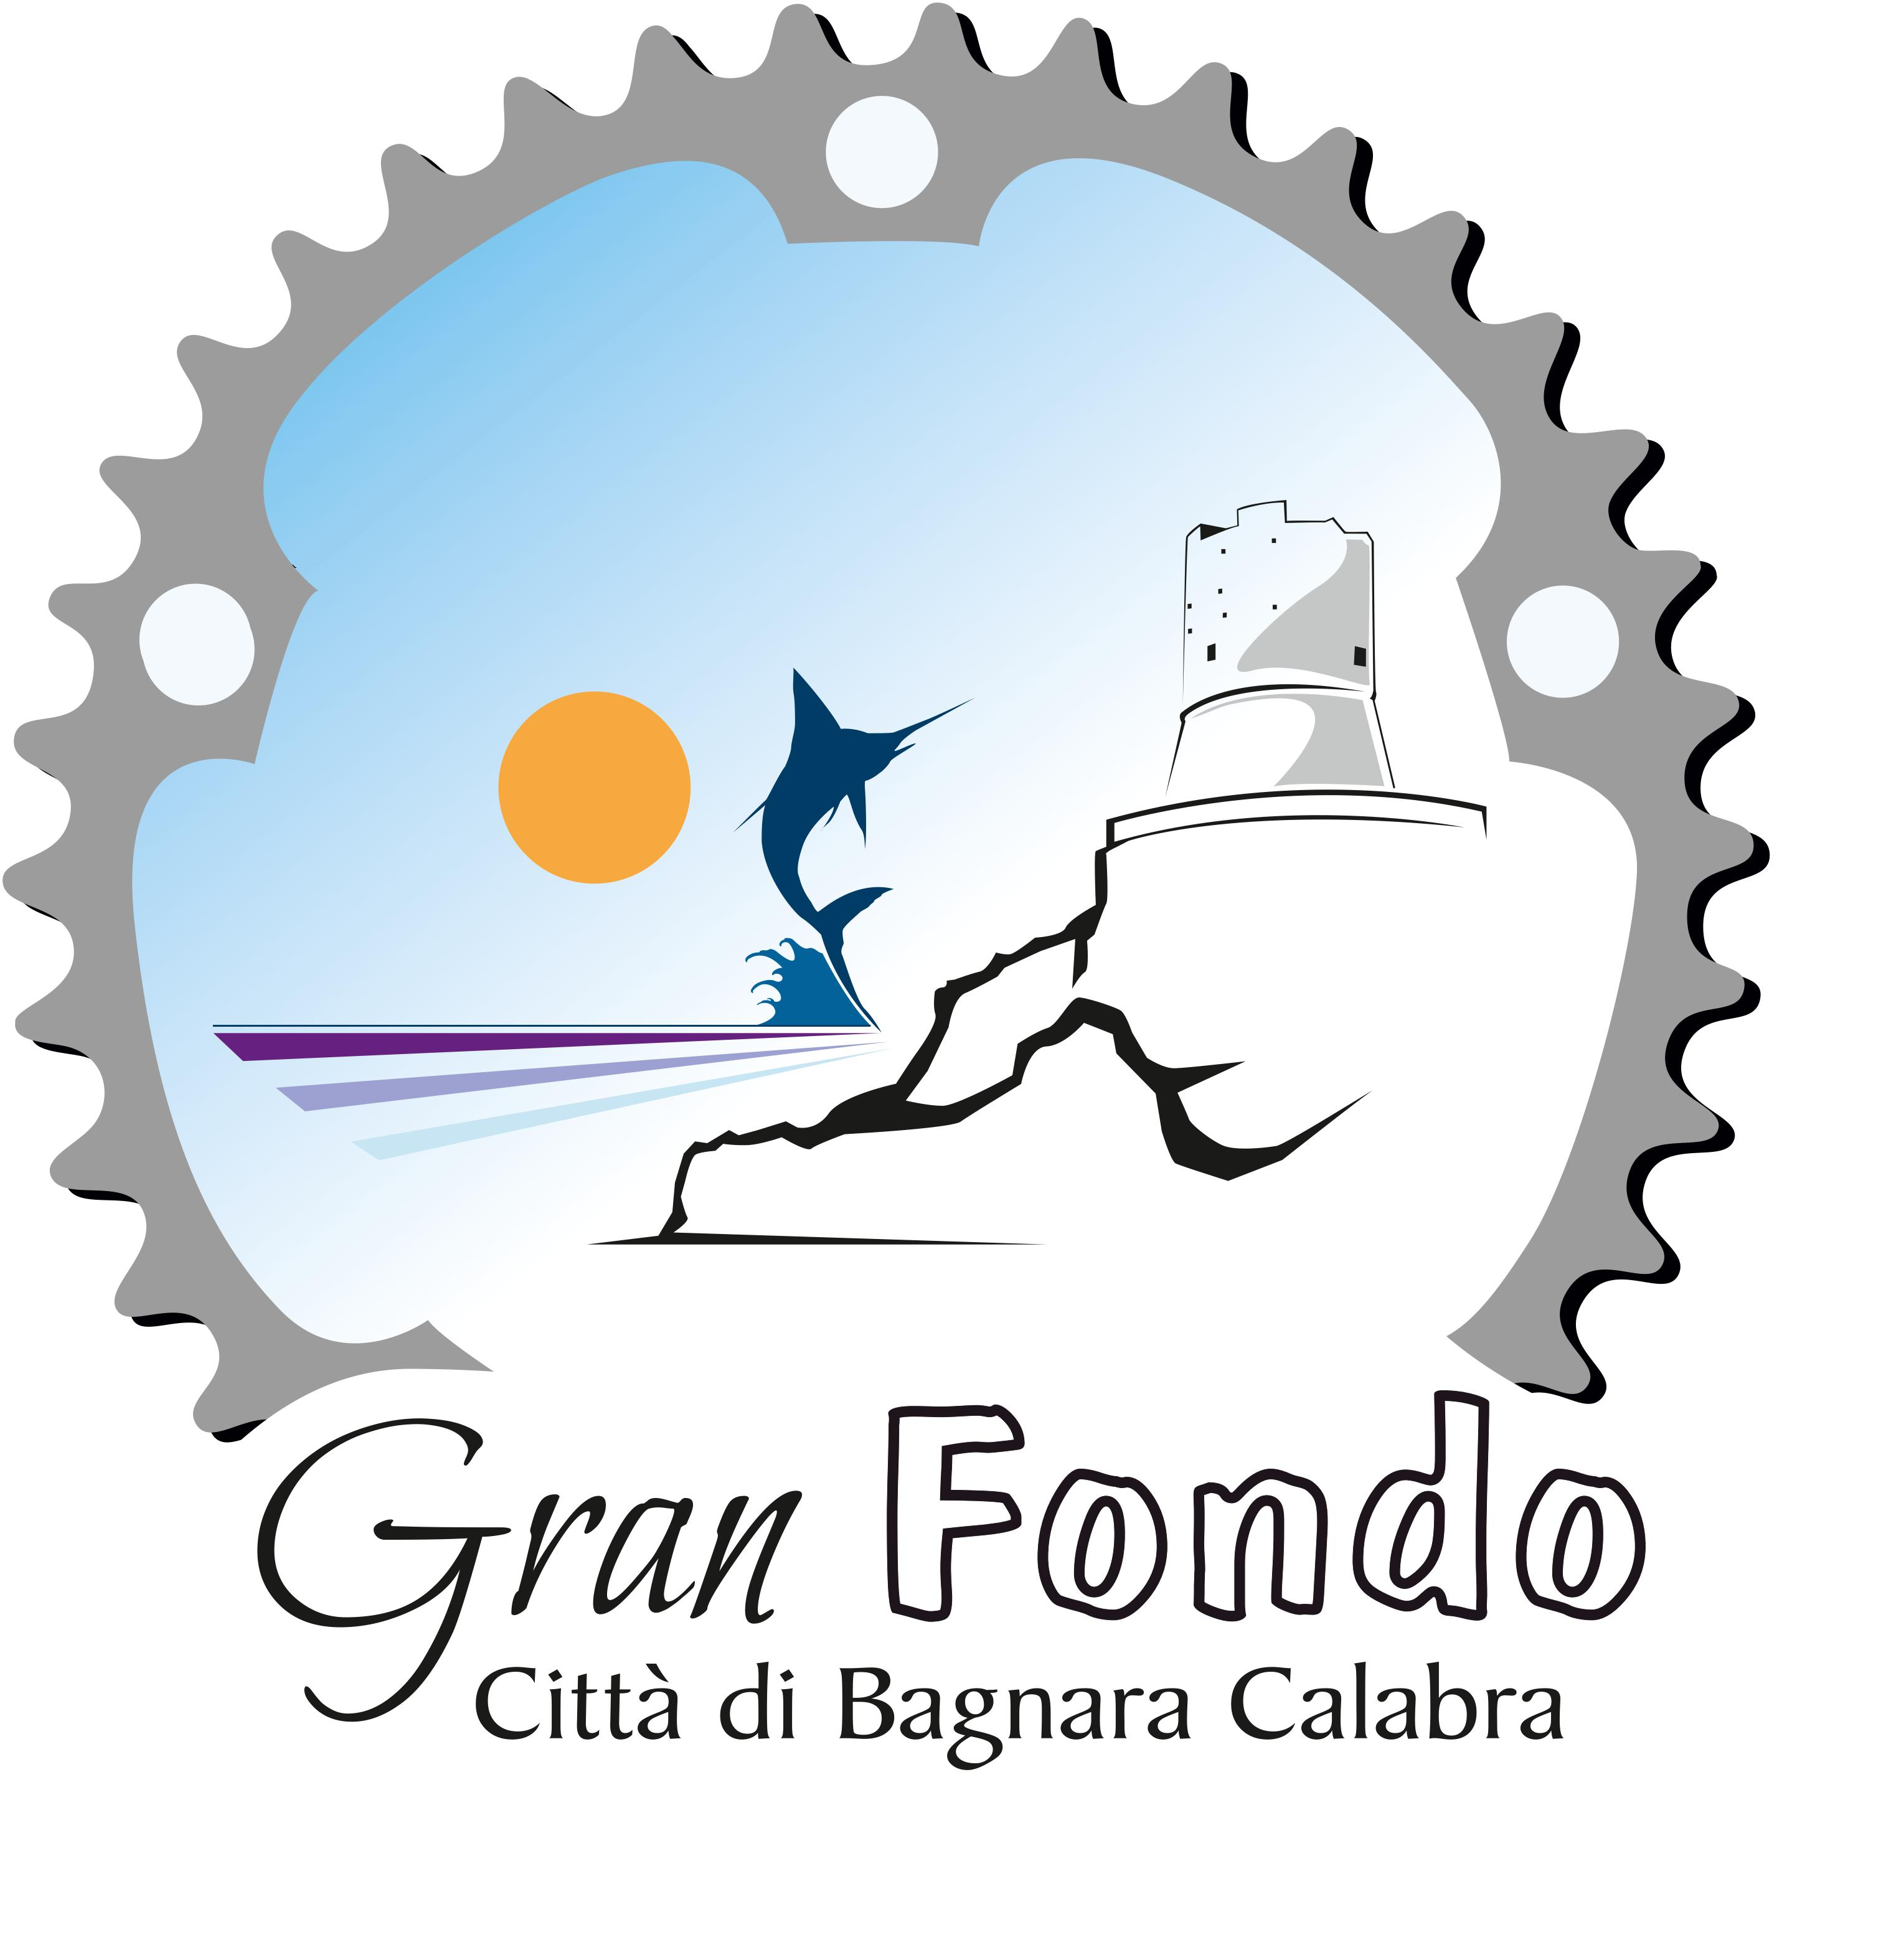 La Gran Fondo Bagnara Calabra celebra la Bagnarota e le eccellenze.